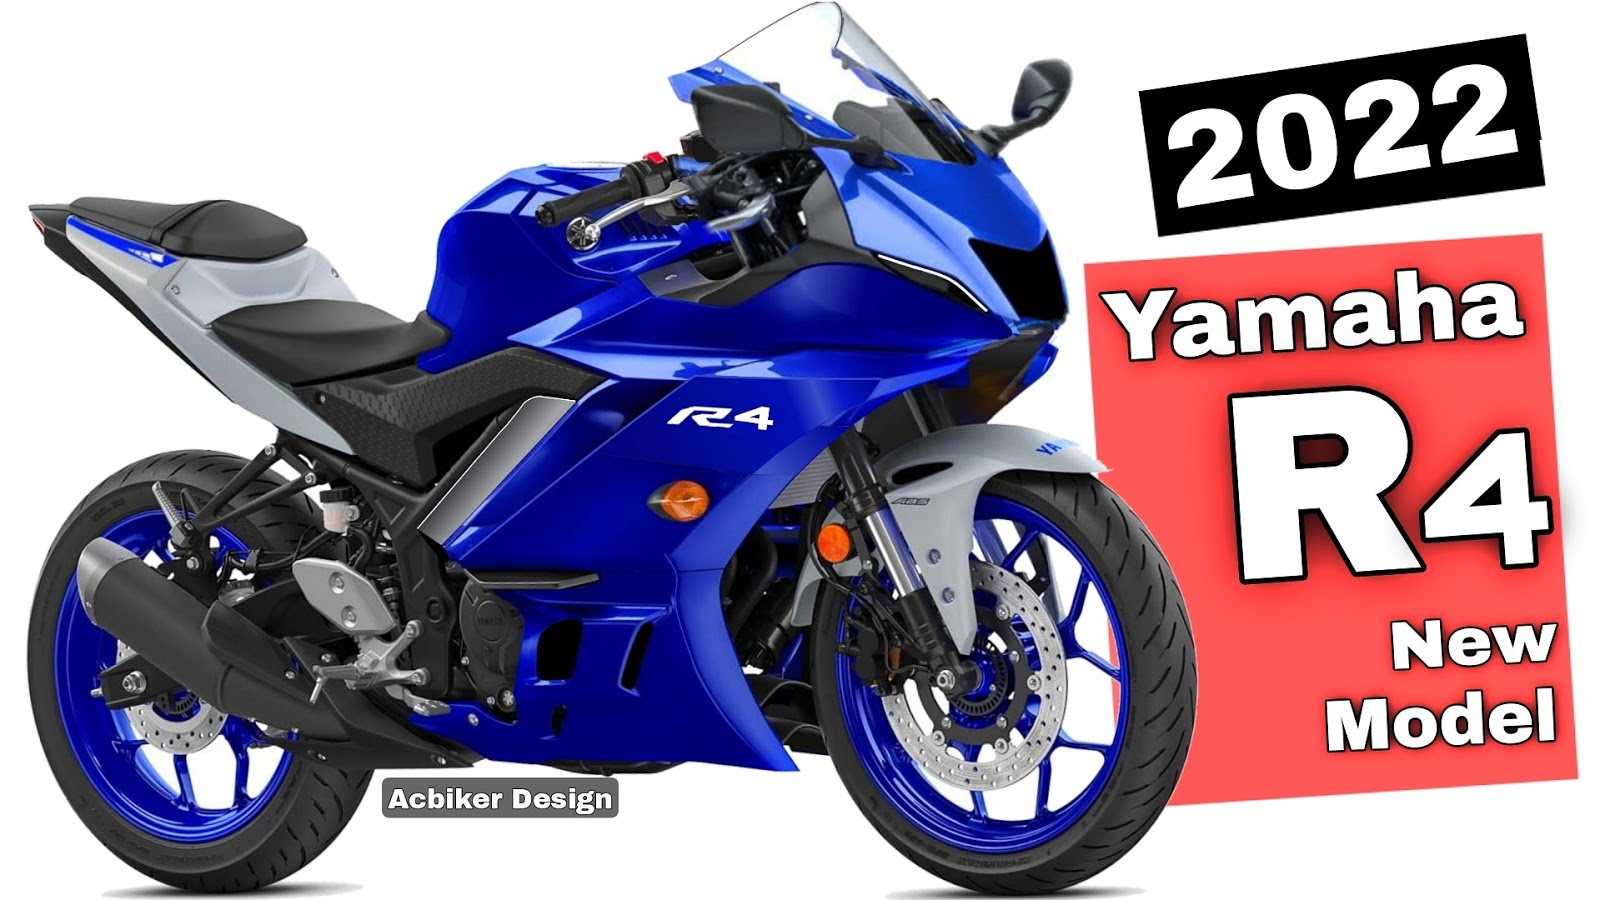 Yamaha R4, Yamaha YZF-R4, yamaha YZFR4, 2022 Yamaha R4, 2021 Yamaha R4, 2022 yamaha YZFR4, 2022 Yamaha YZF-R4,2022 Yamaha r4,Yamaha r4 2021,yamaha r4,yamaha r4 price philippines,yamaha r400,yamaha r4 2020,yamaha r4 top speed,yamaha r4 for sale,yamaha r4 390cc,yamaha r4 price in india 2021